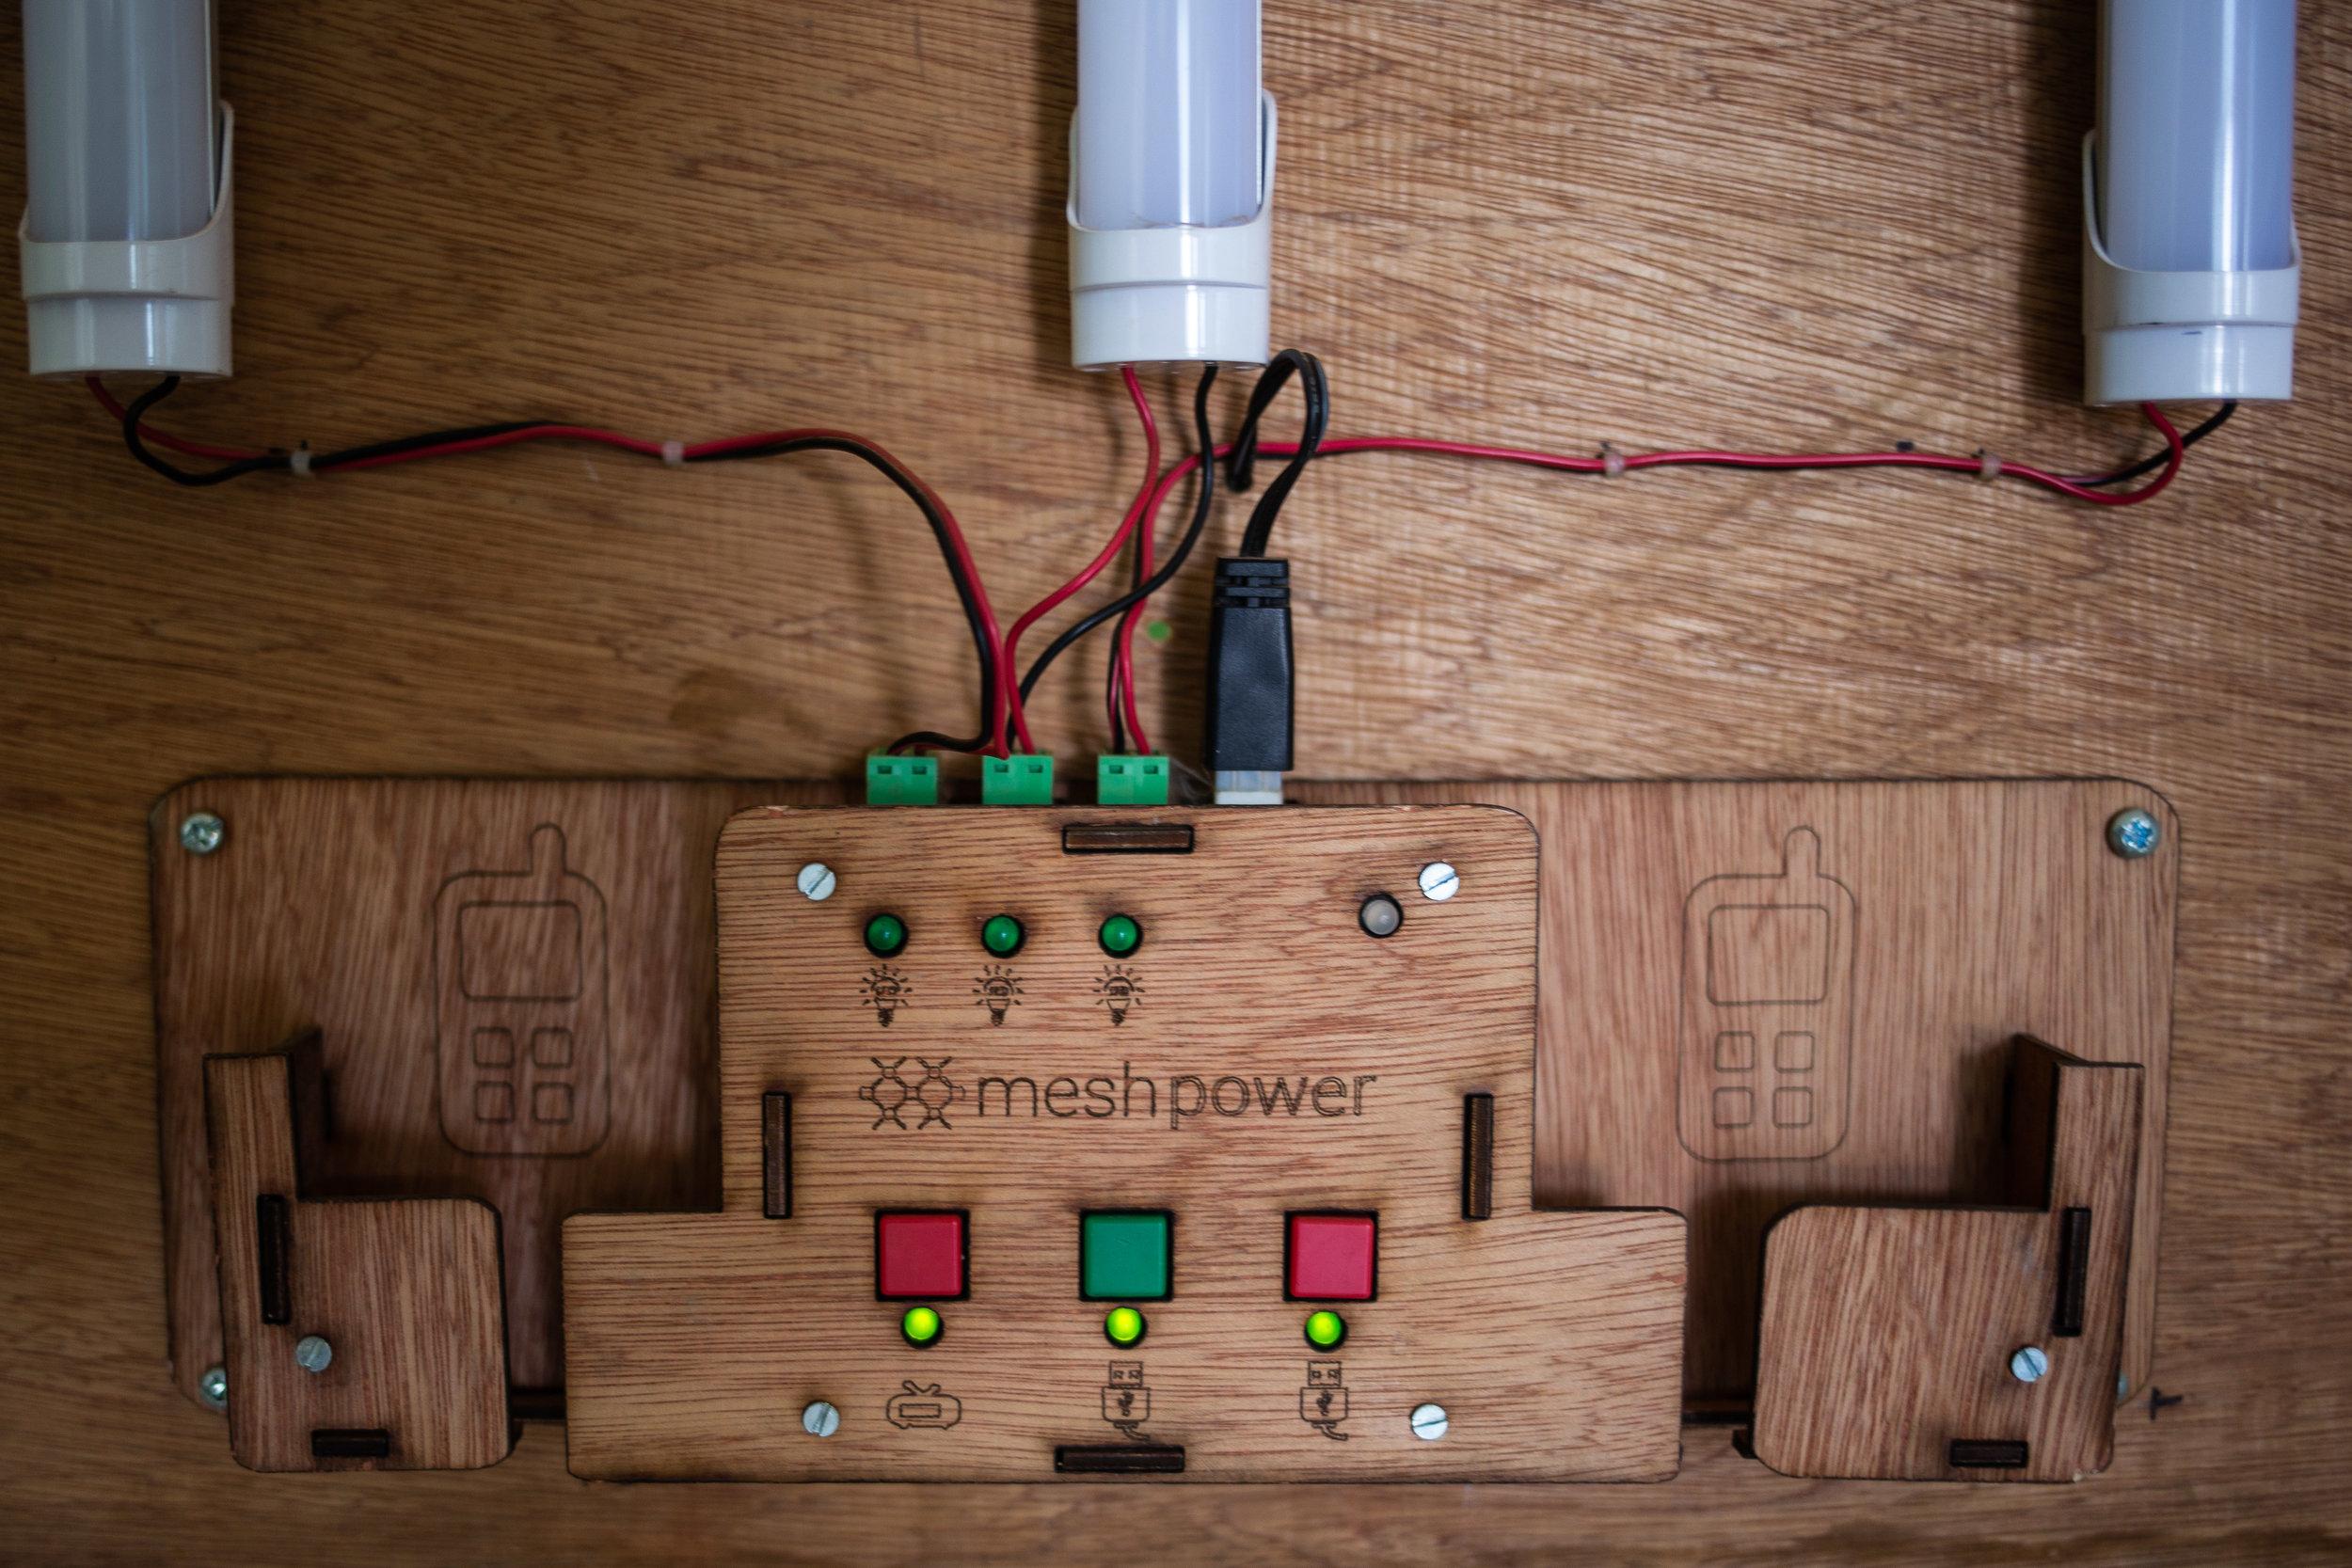 Rwanda's mini-grid developer  MeshPower 's switchboard - Kigali 2018